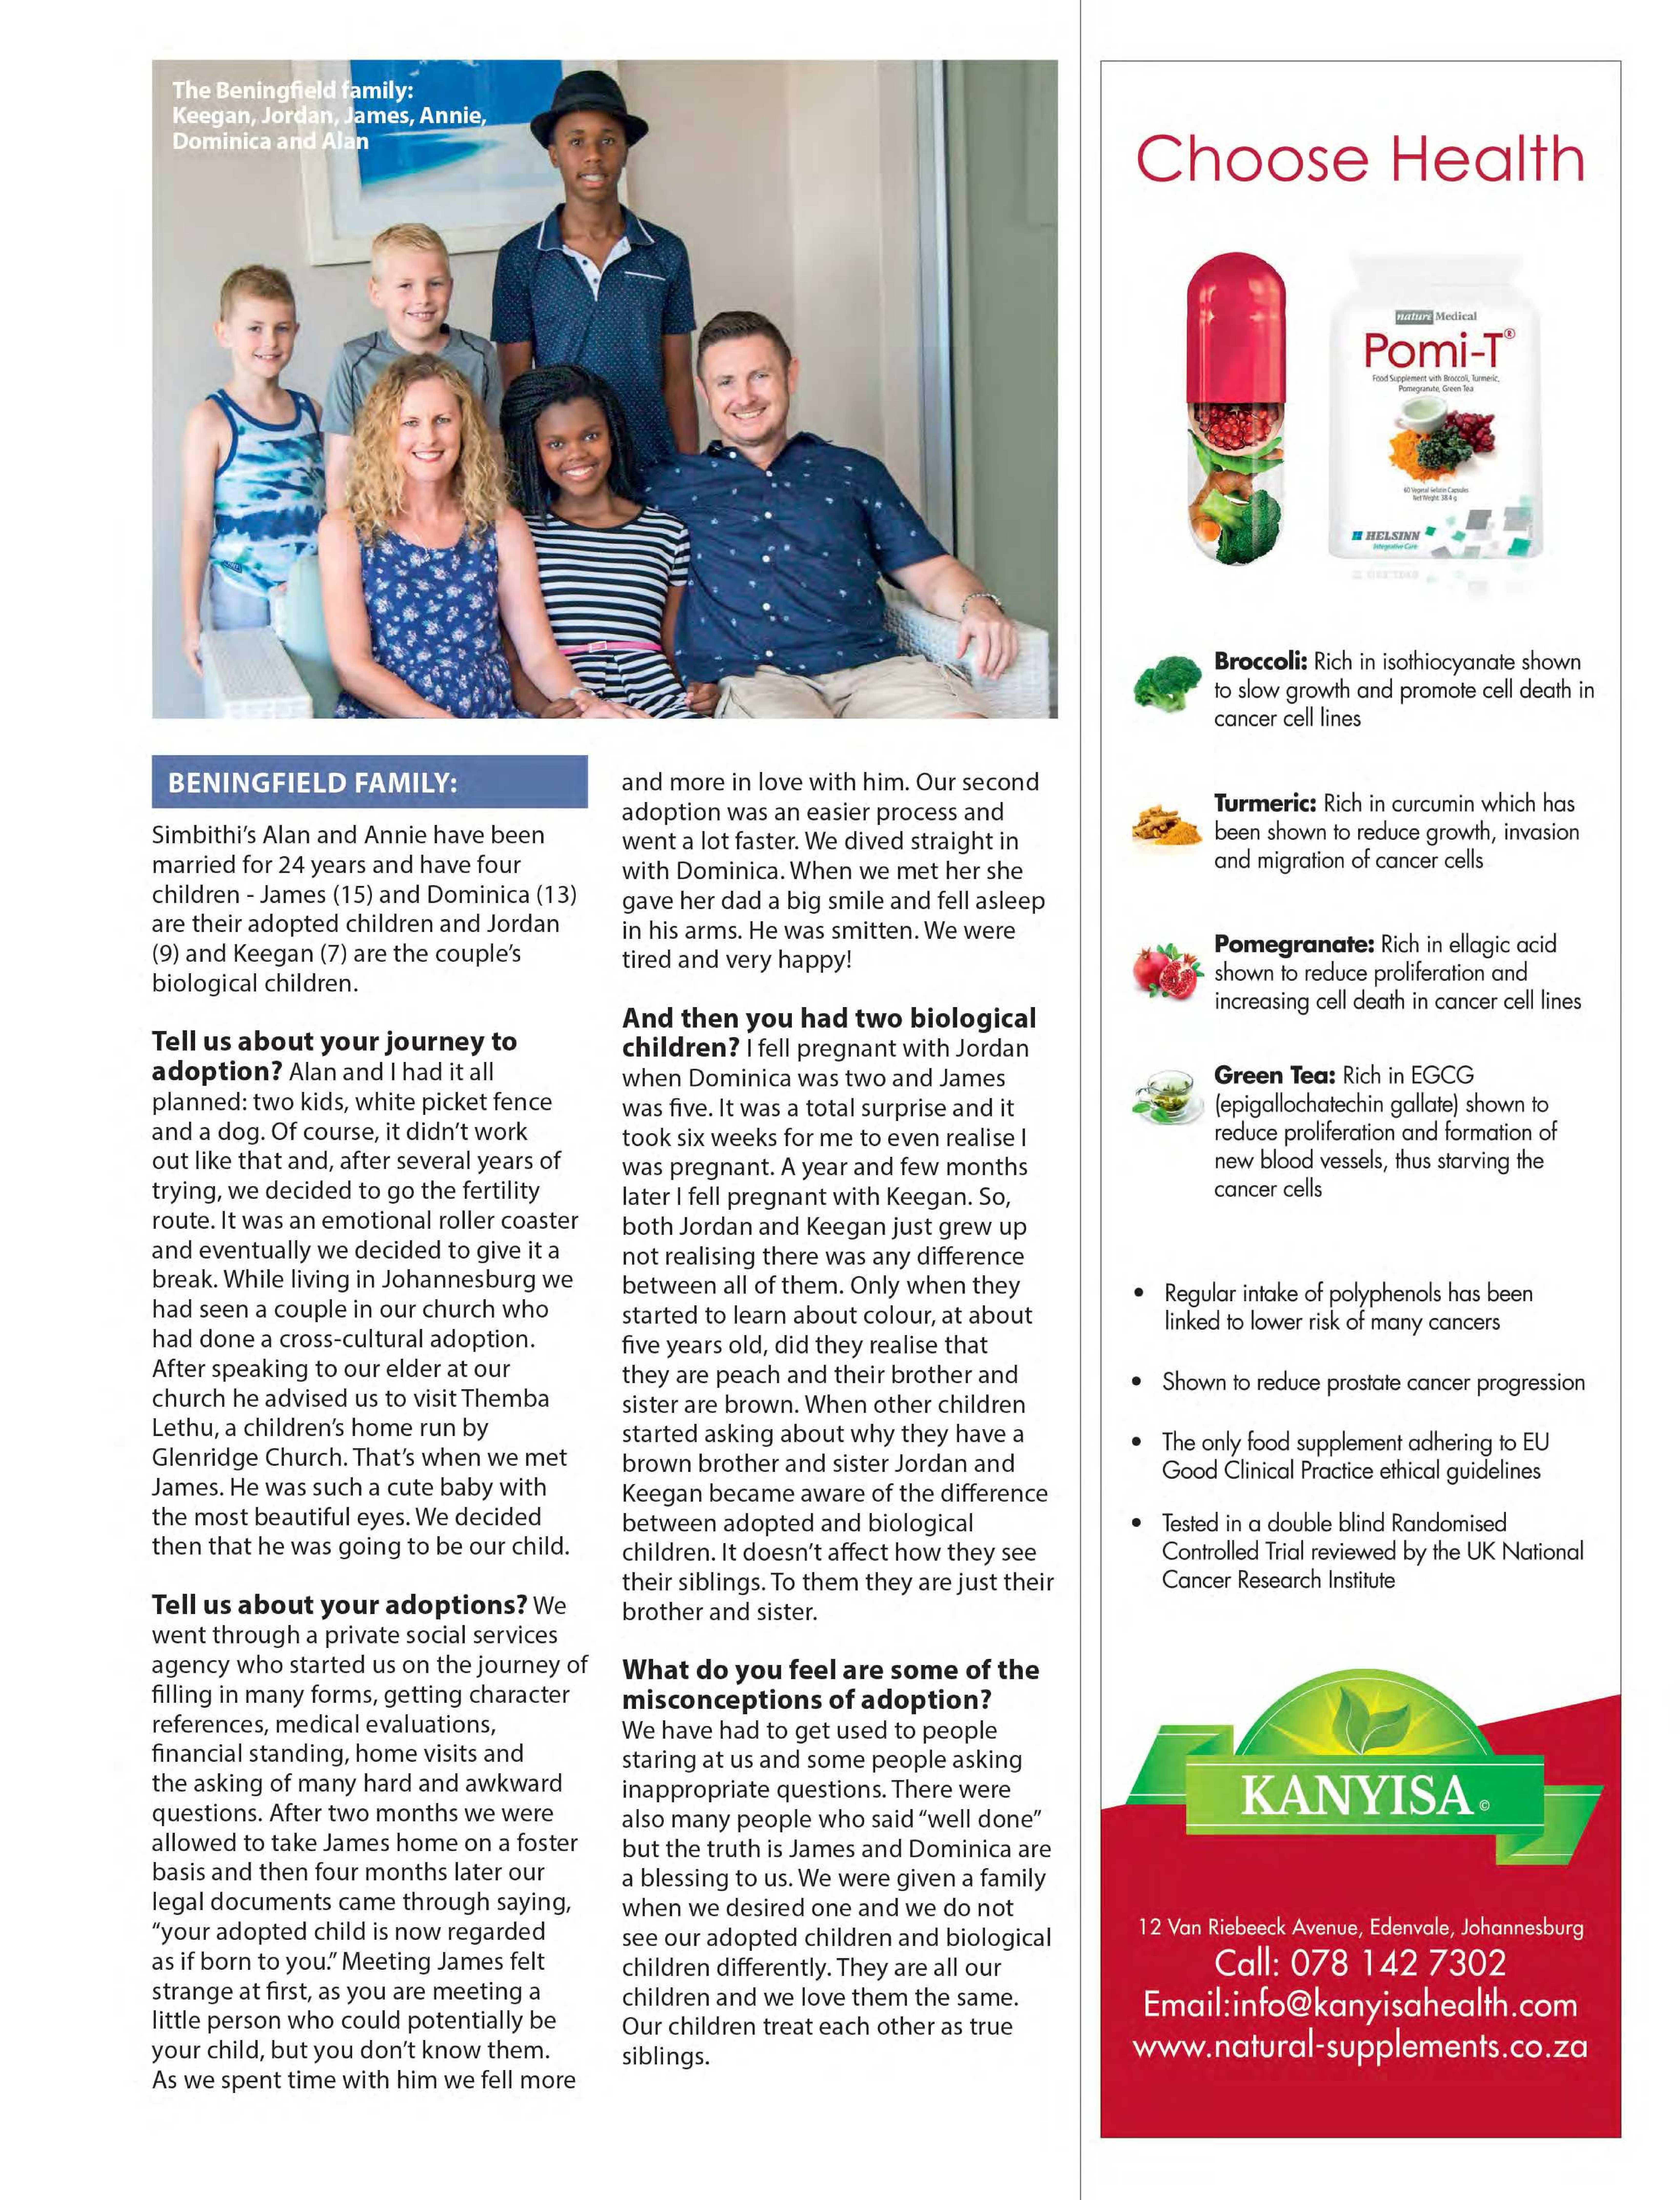 get-magazine-ballitoumhlanga-july-2018-epapers-page-21